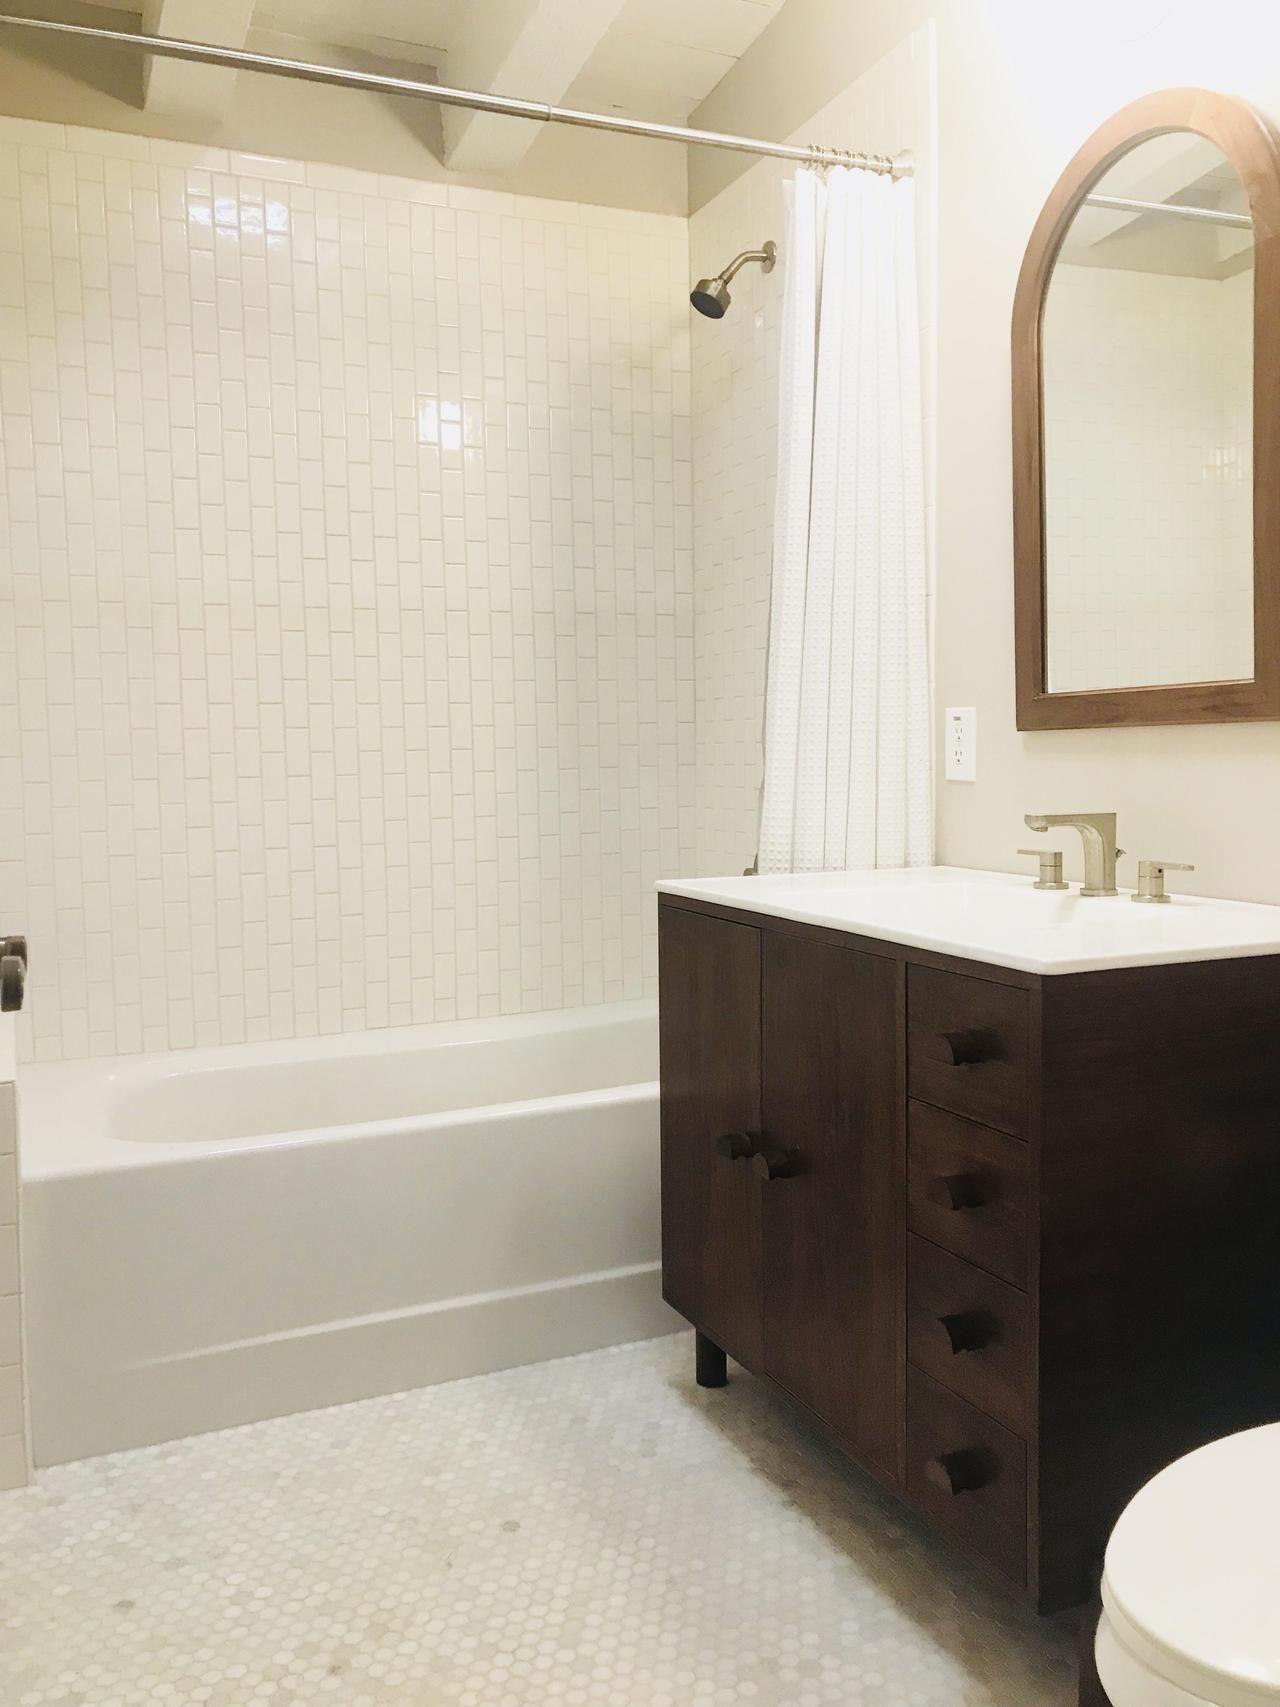 Home Interior Design — Simple Guest Bathroom in 1937 Adobe ...